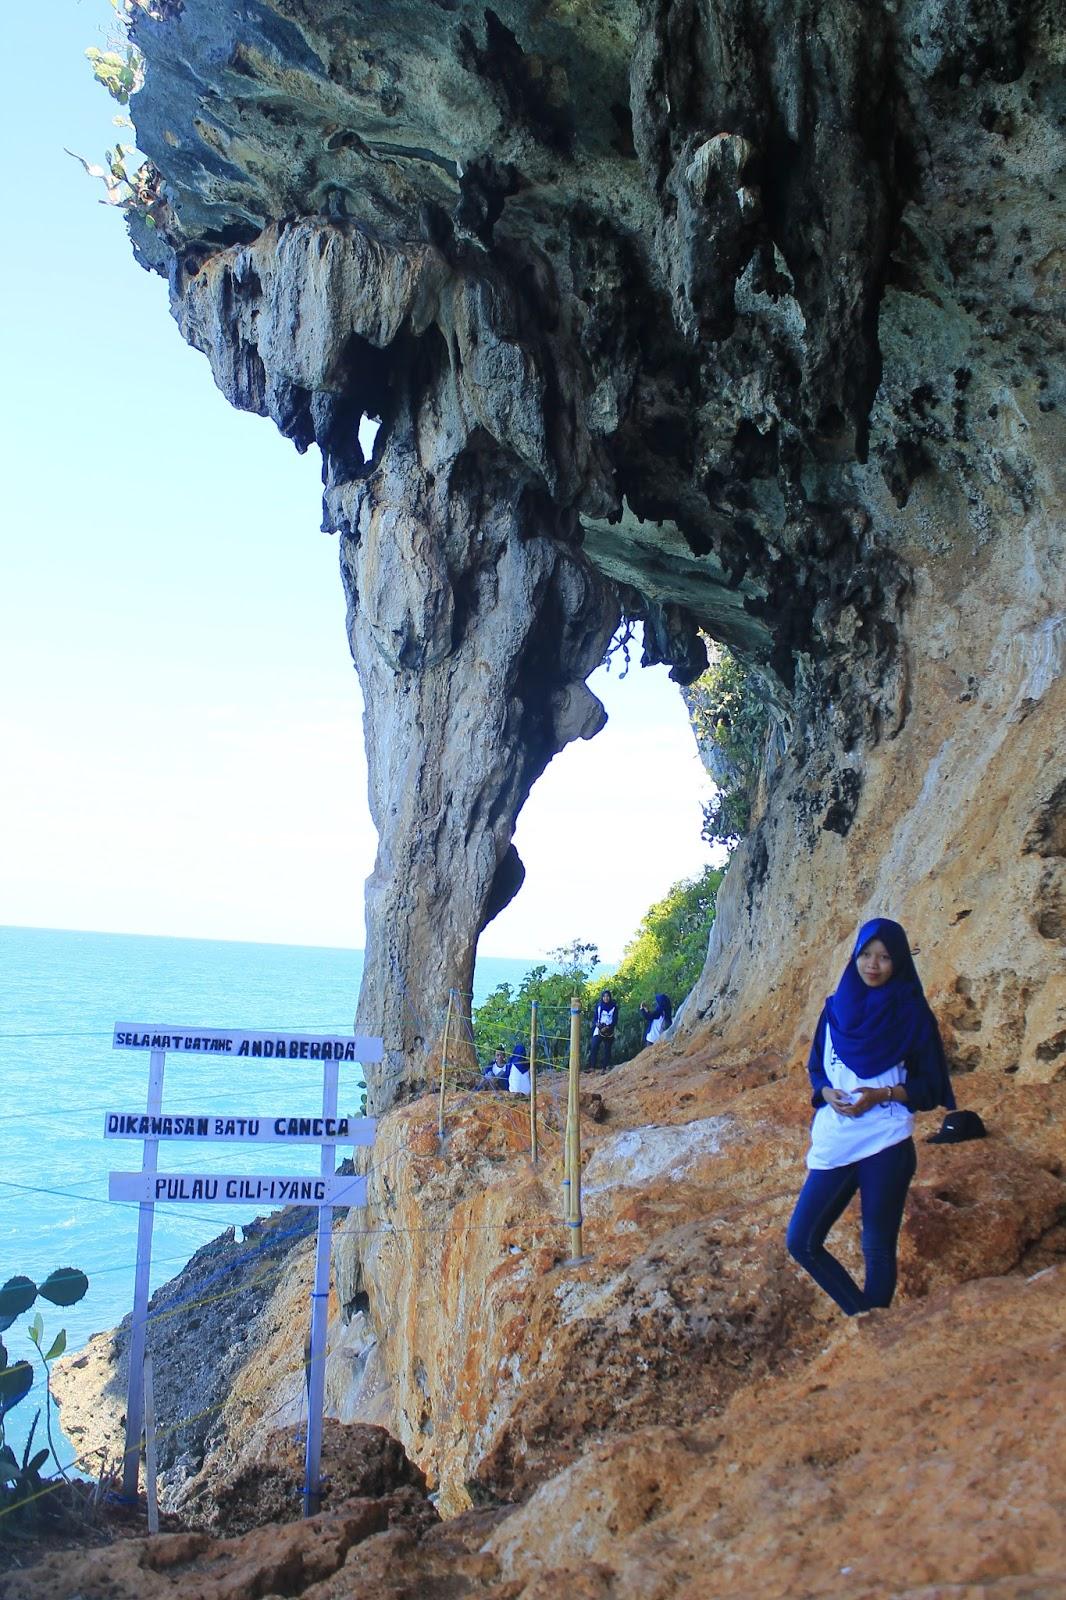 Cantiknya Wisata Batu Canggah Gili Iyang Desa Bancamara Pulau Oksigen